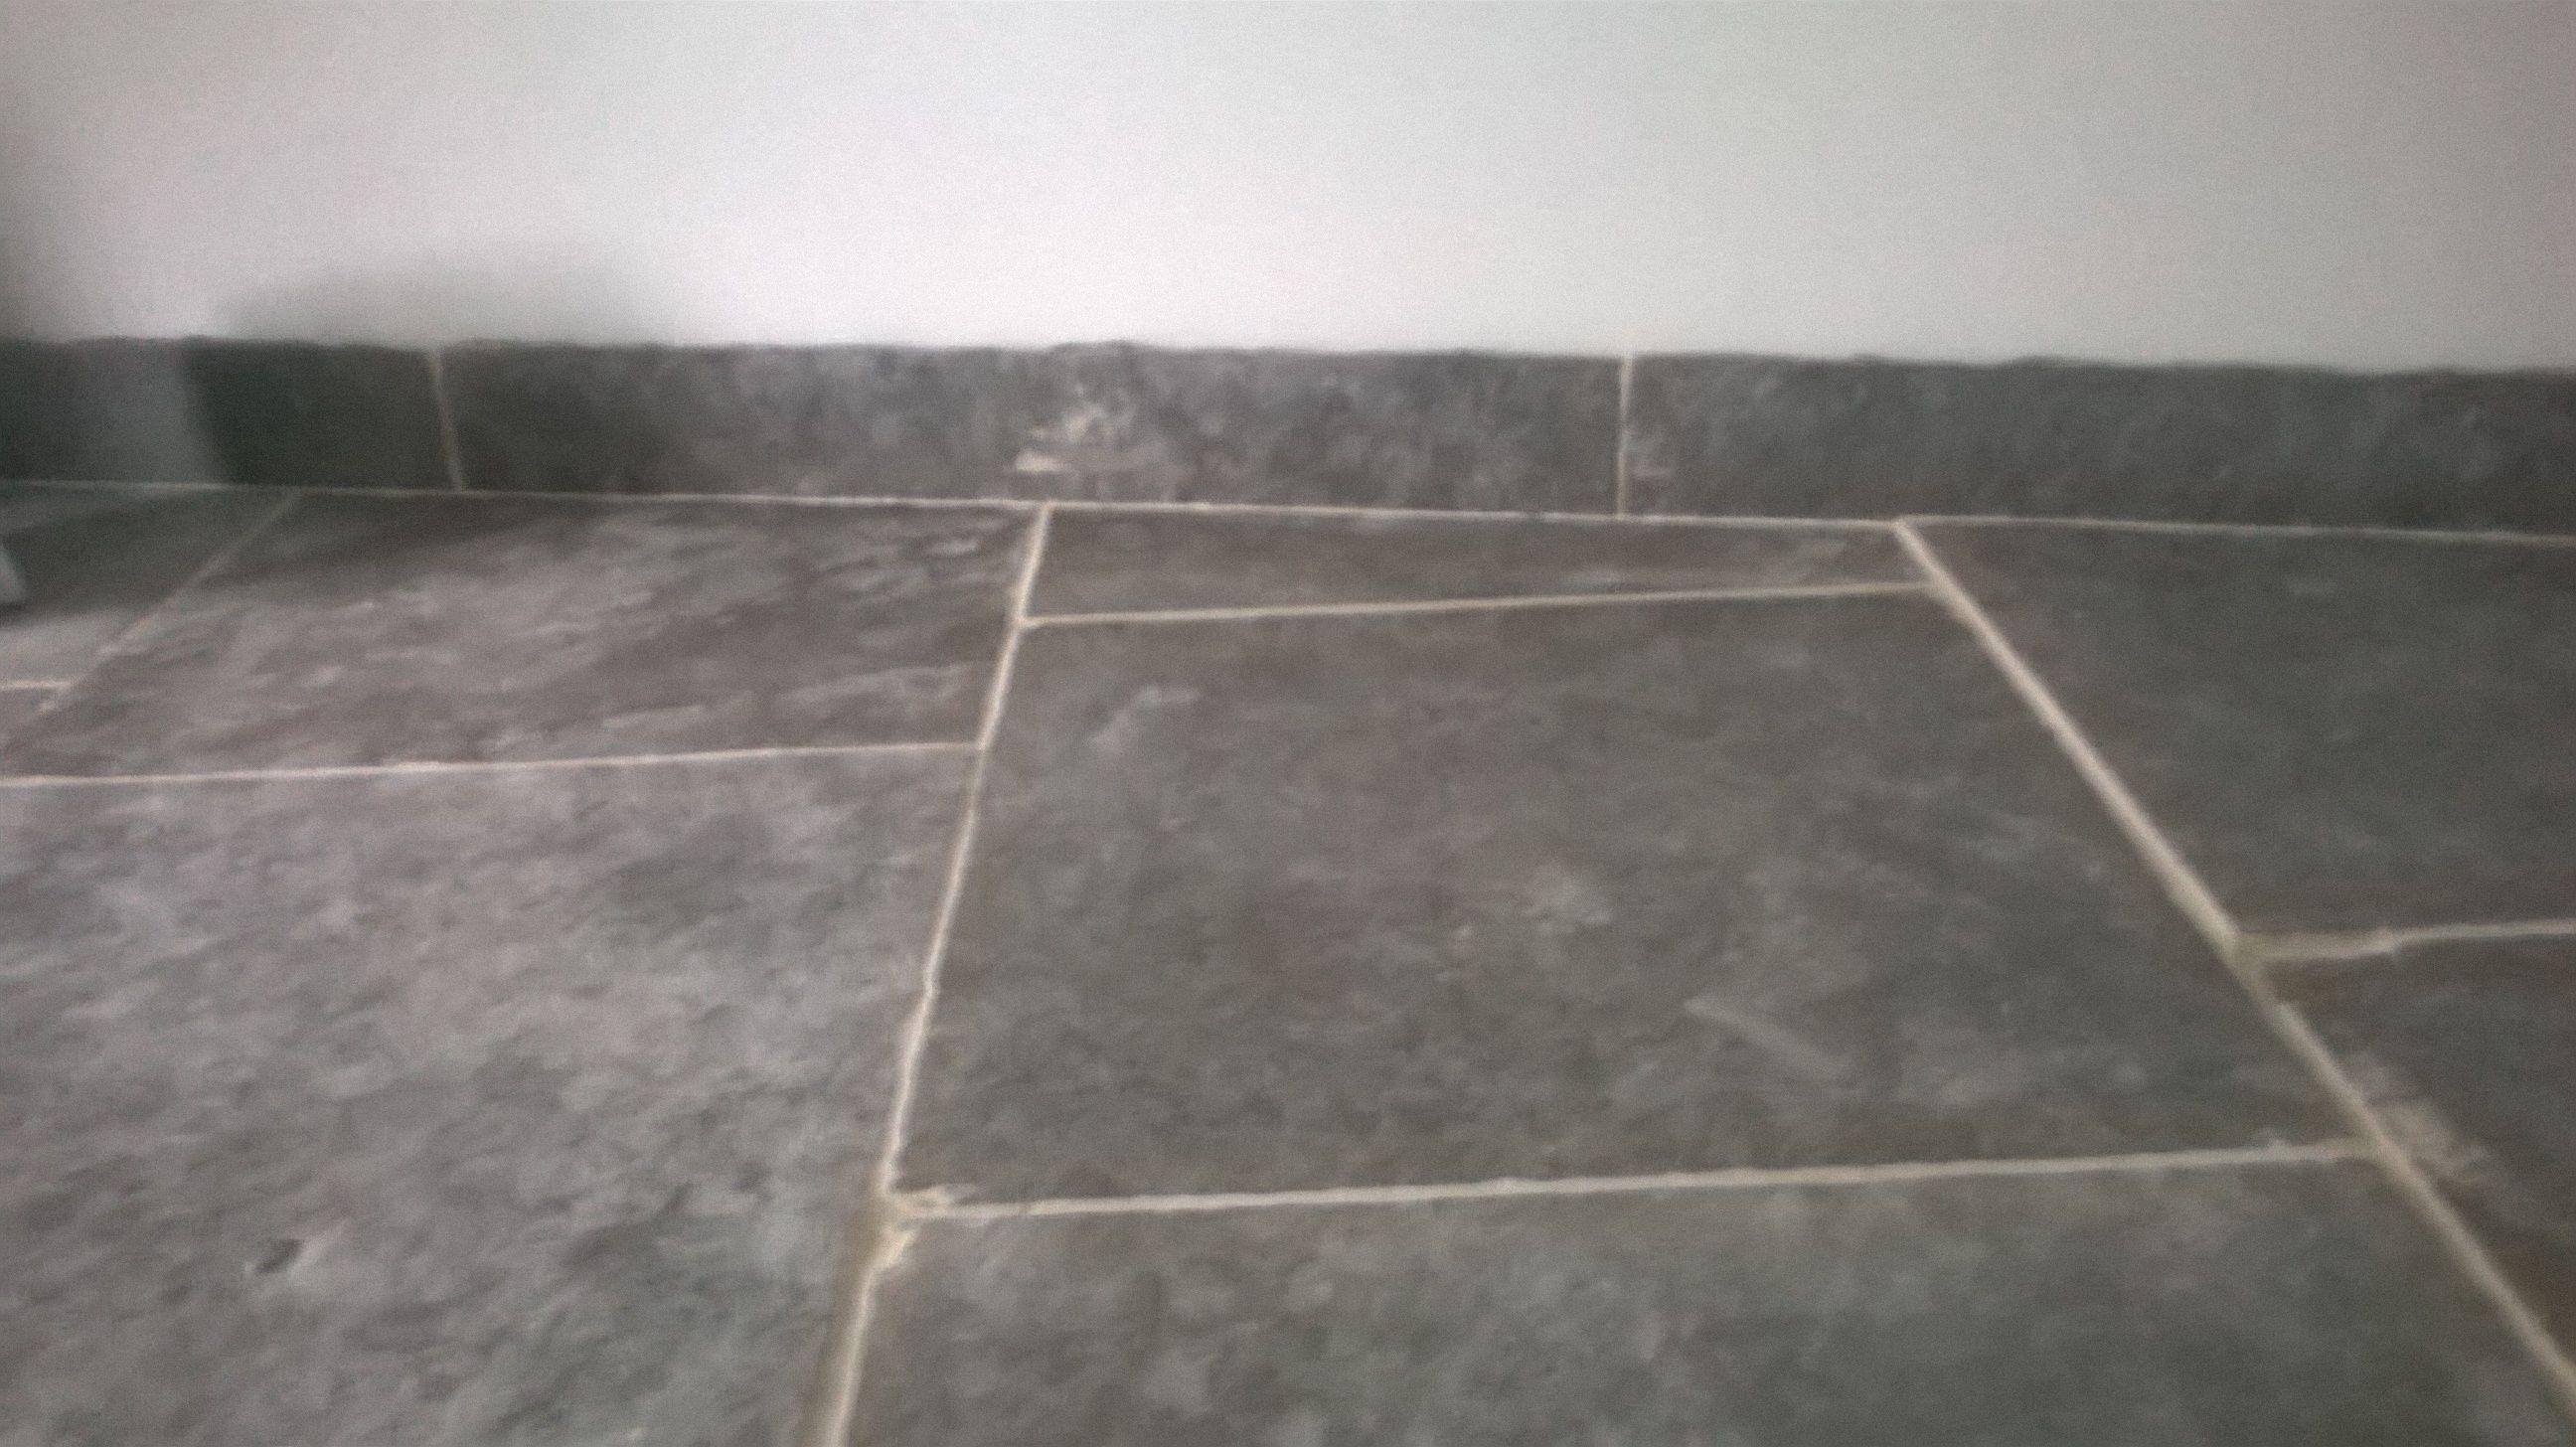 Matching skirting windermere blue grey limestone floor supplied matching skirting windermere blue grey limestone floor supplied and designed by eden stone emporium doublecrazyfo Image collections